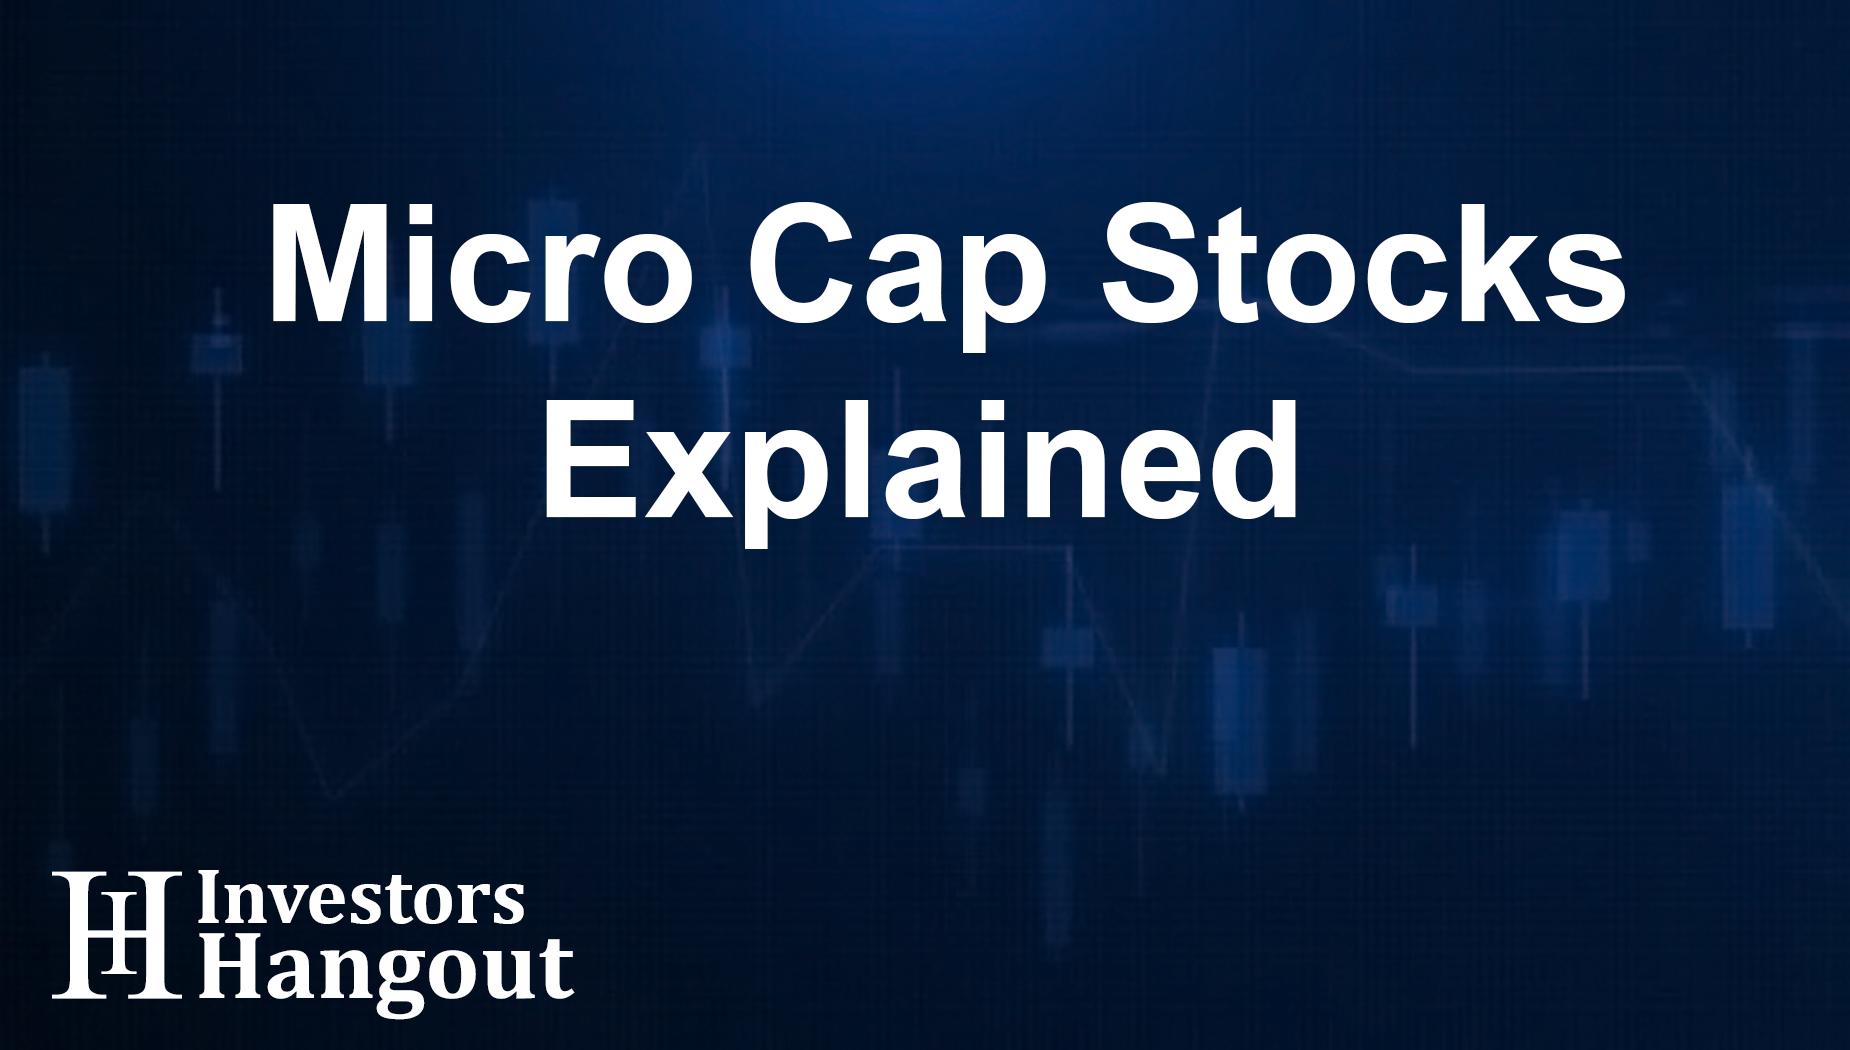 Micro Cap Stocks Explained